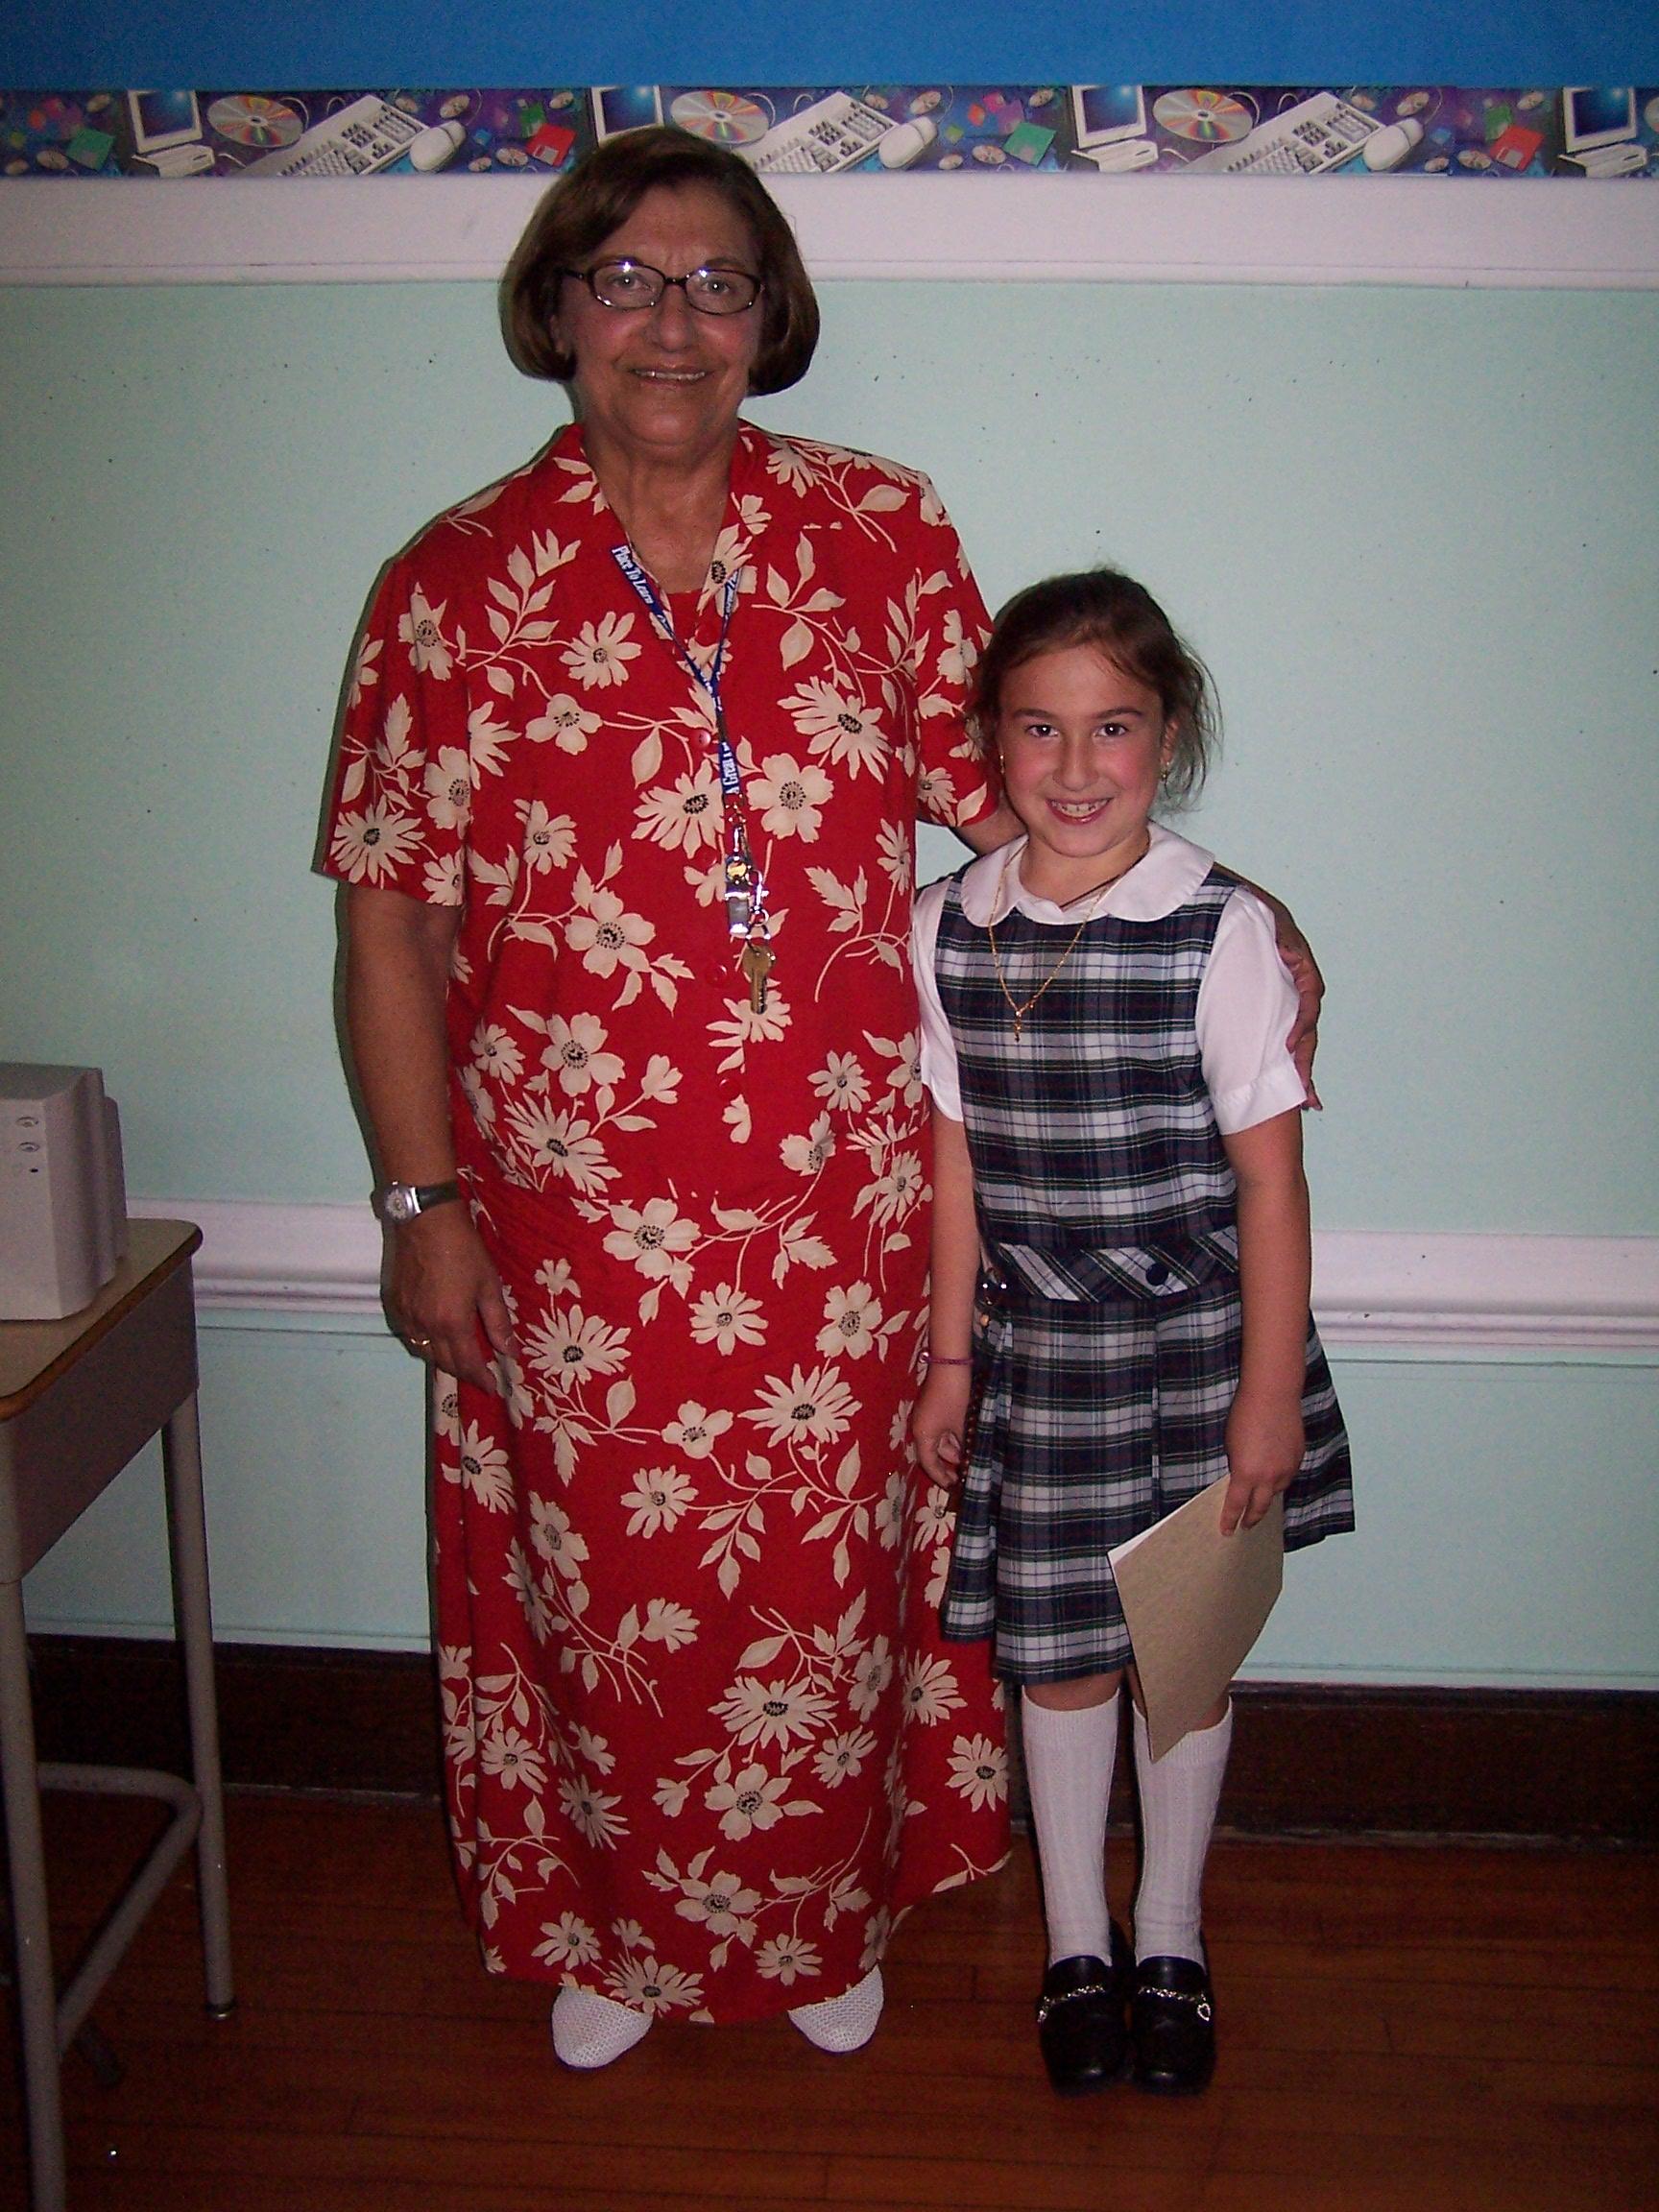 Miss Huresky as an OLMC second grader